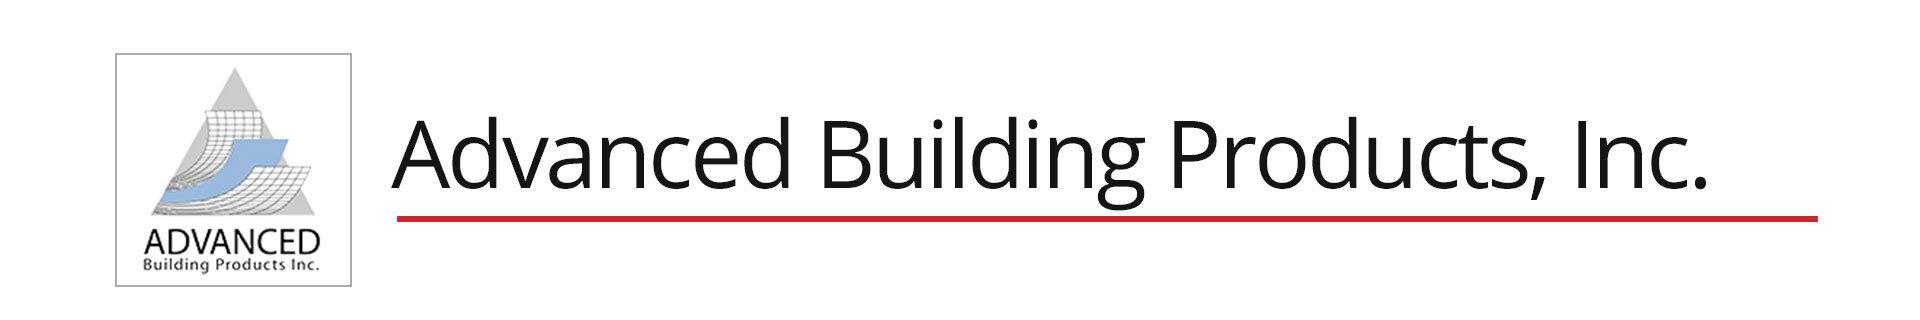 AdvancedBuildingProducts_CADBlock-Header.jpg